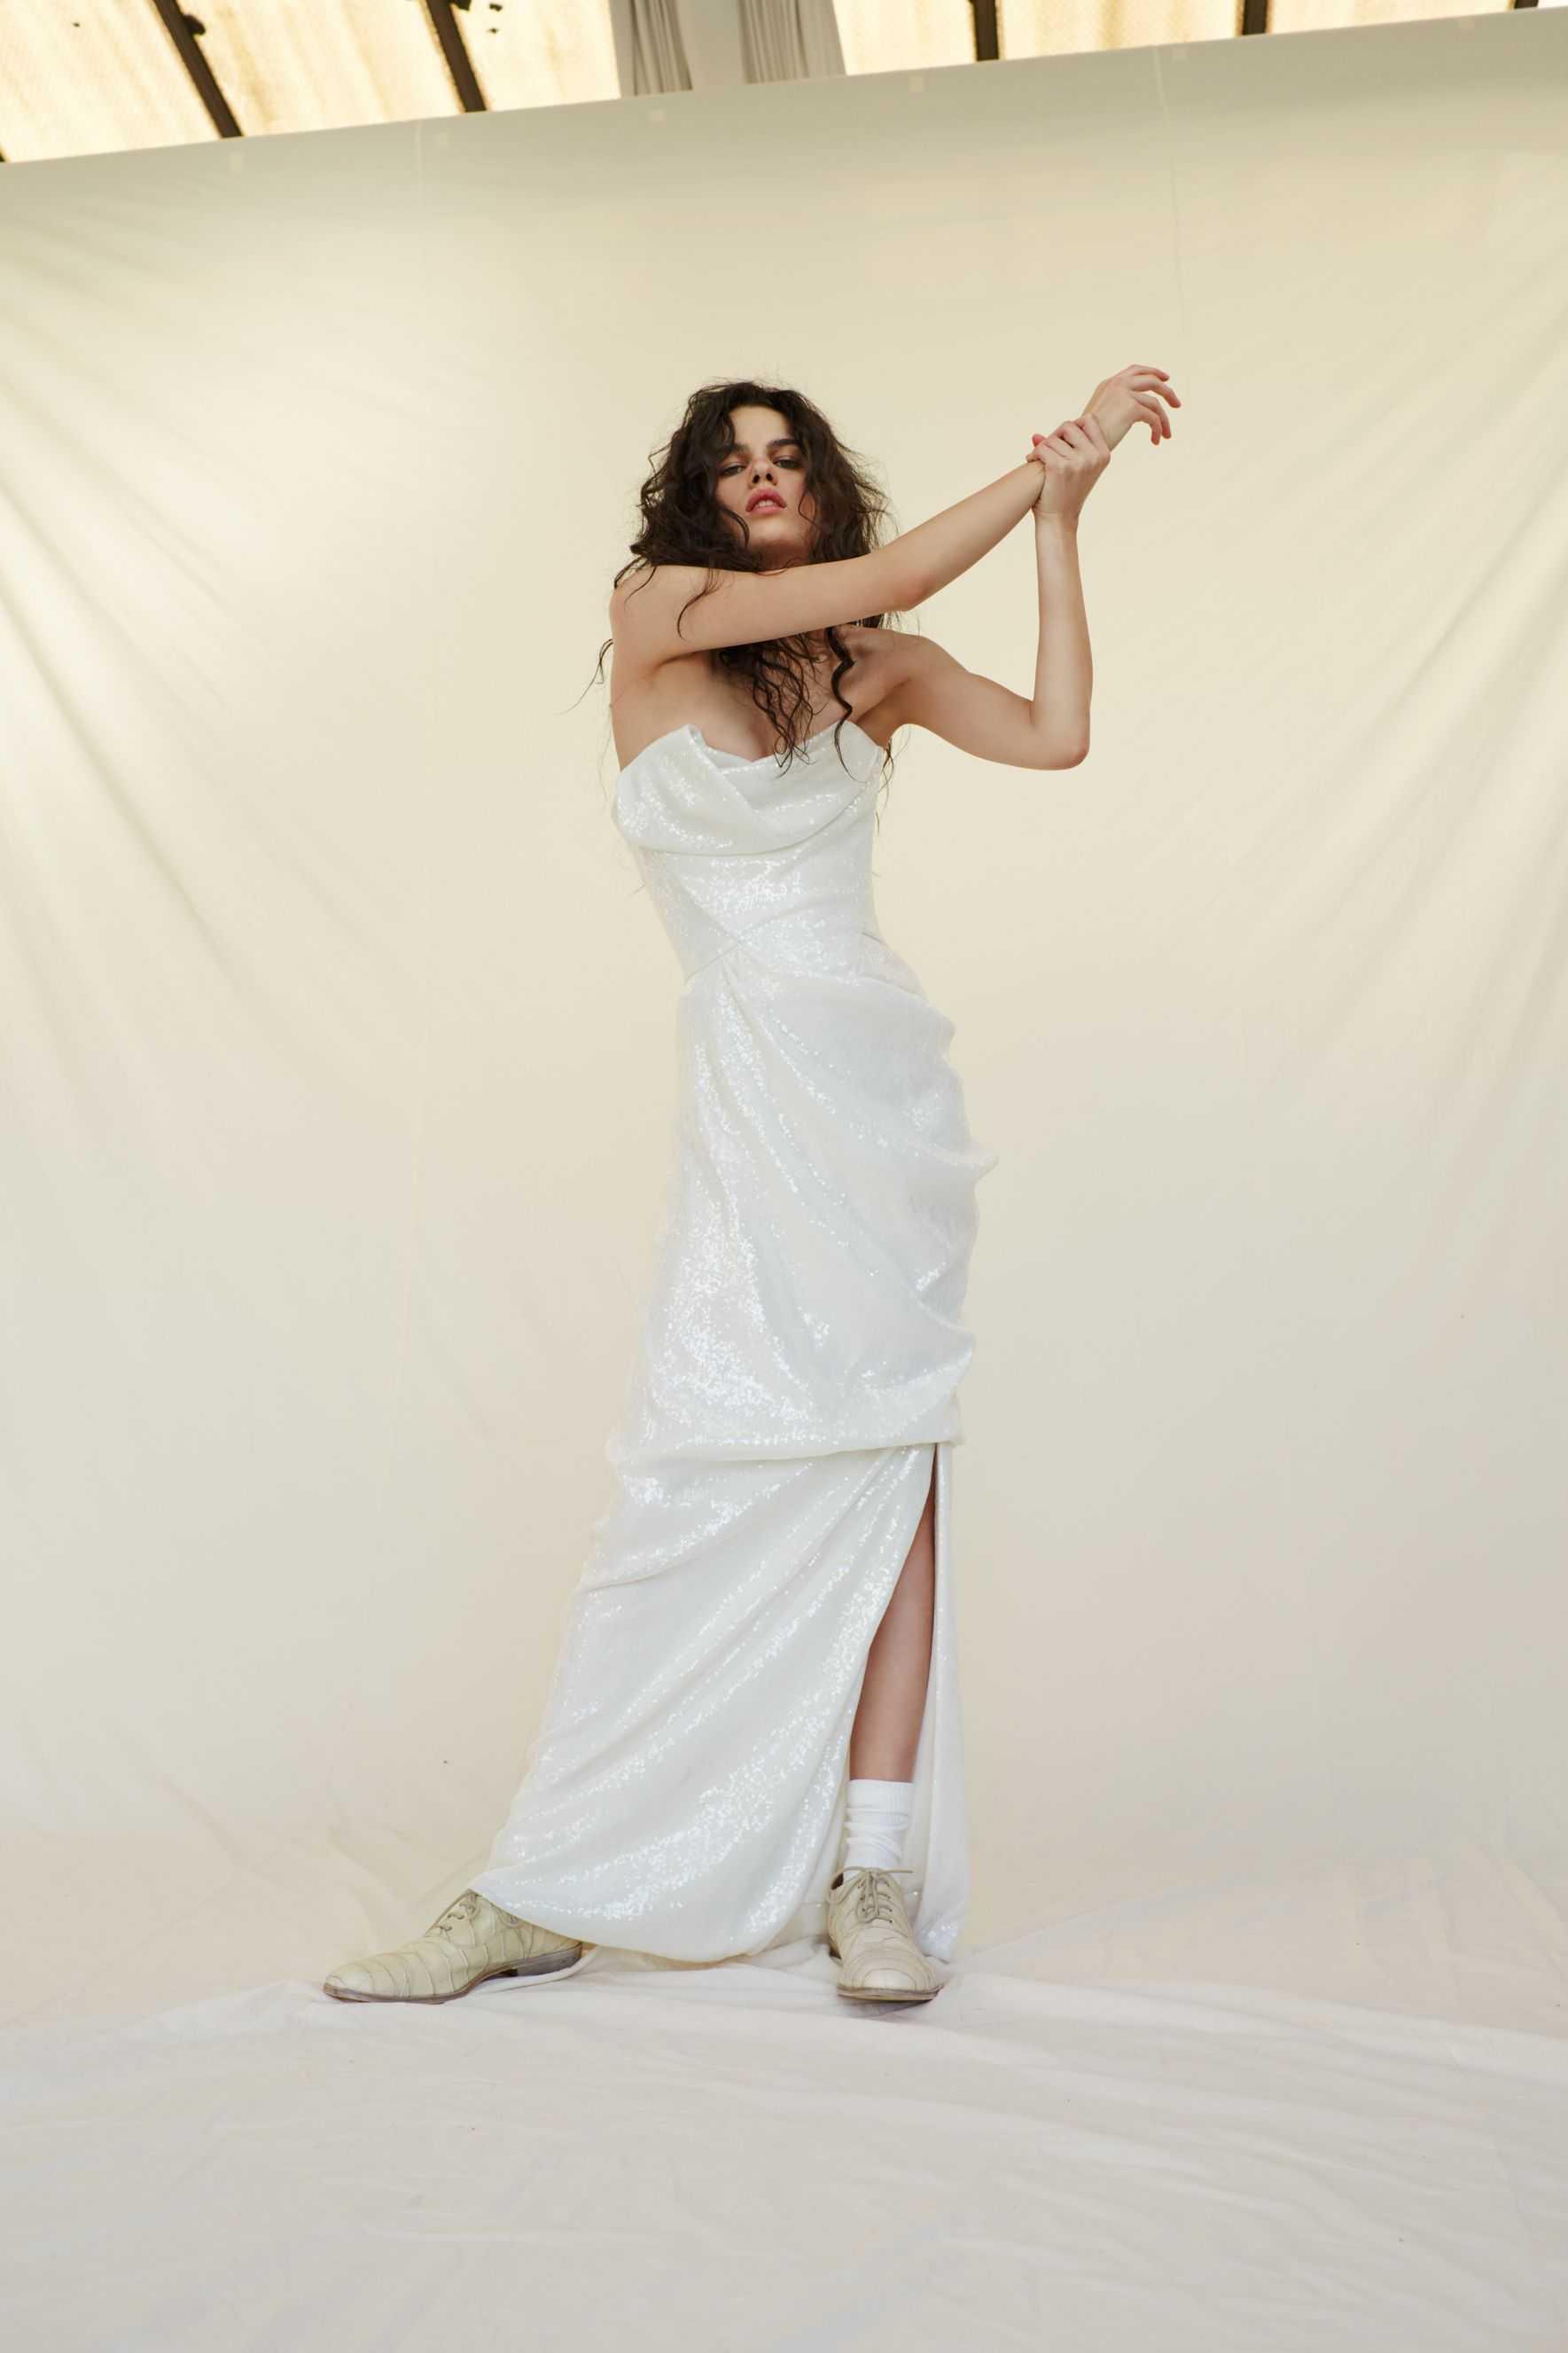 Vivienne Westwood Wedding Dress | Bridal Made To Order Ss17 Vivienne Westwood